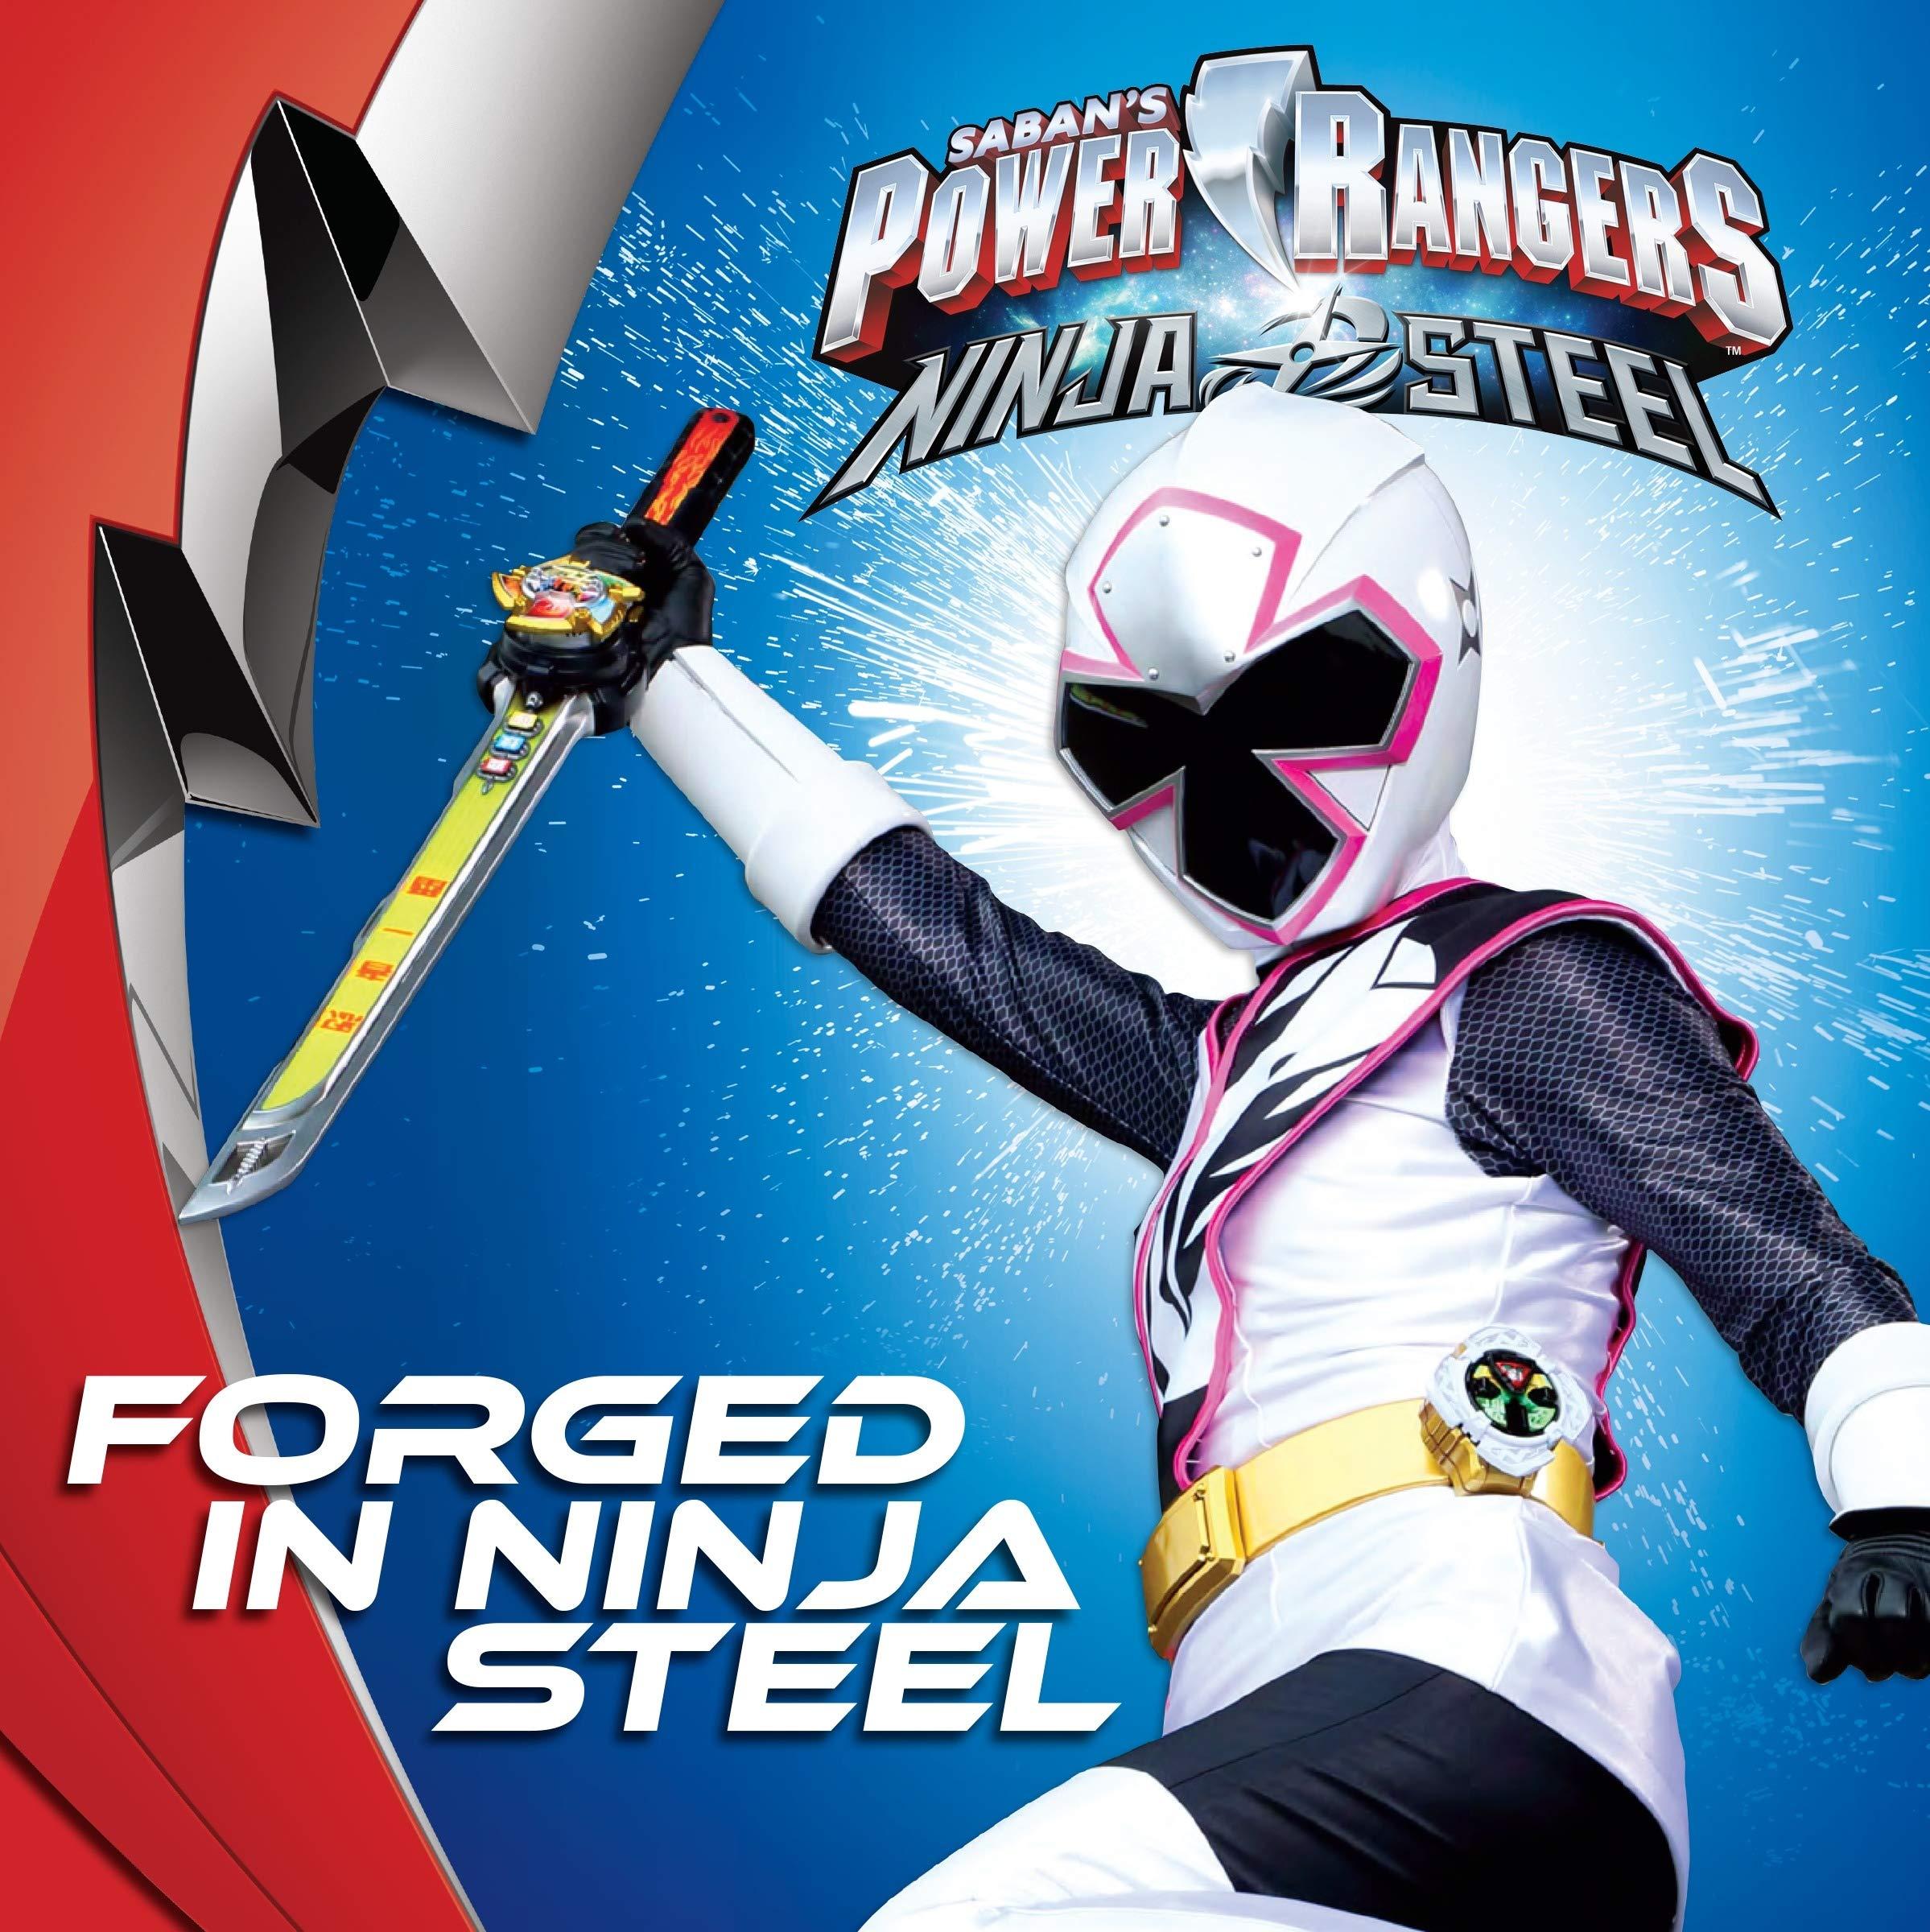 Forged in Ninja Steel Sabans Power Rangers Ninja Steel ...